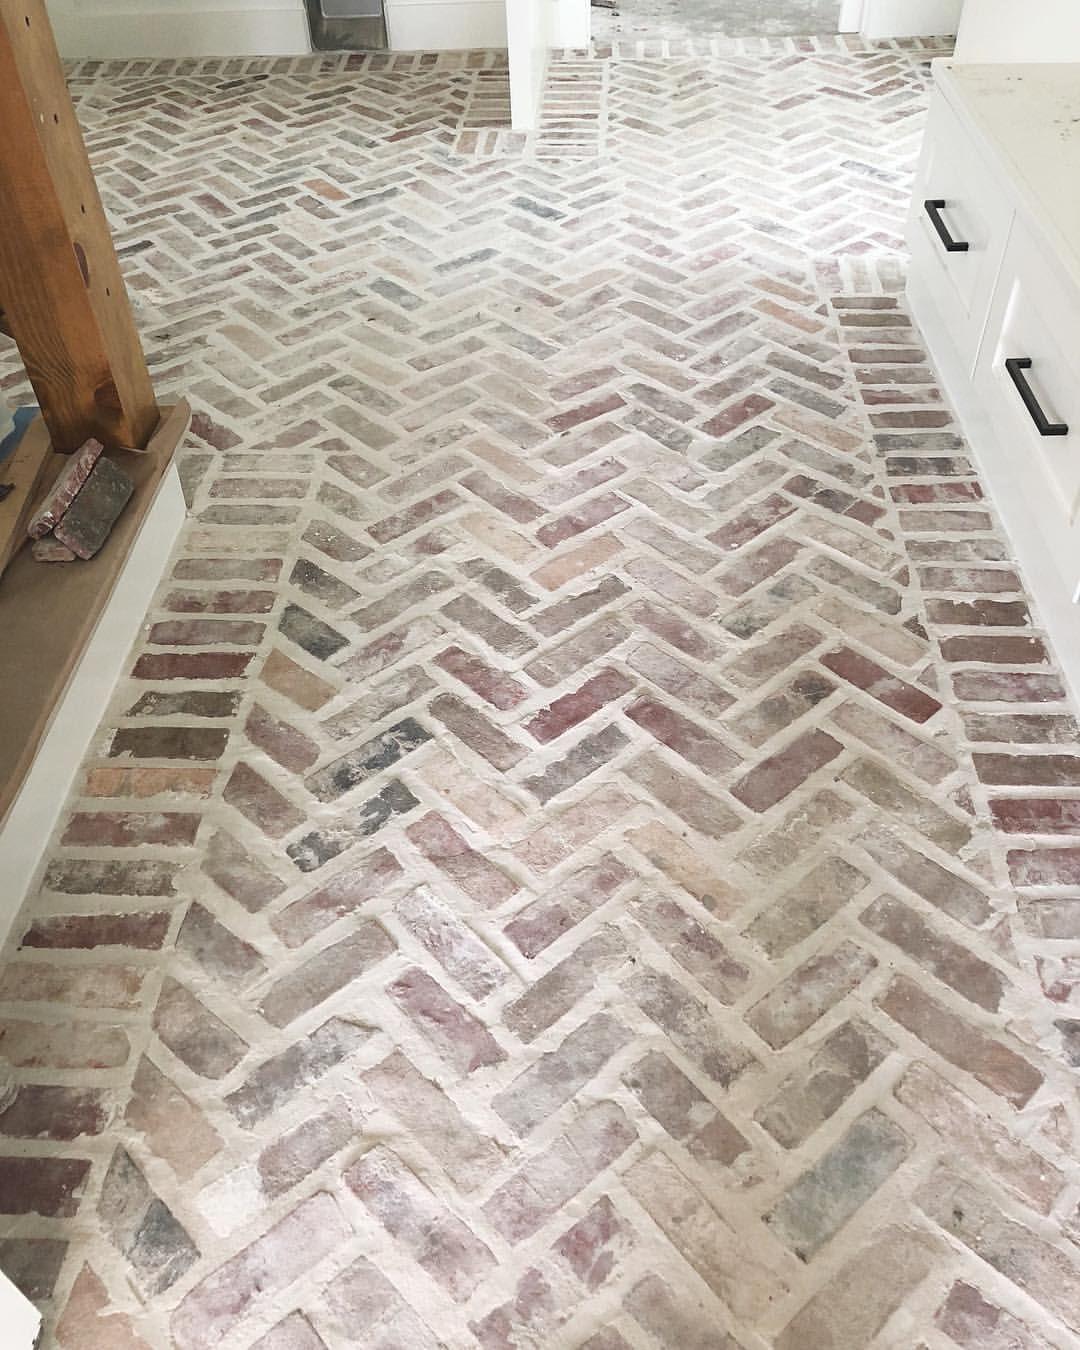 flooring options cork cheapest basement flooring vynil flooring oak rh pinterest com Laminate Flooring Before and After Rehab Cheapest White Flooring